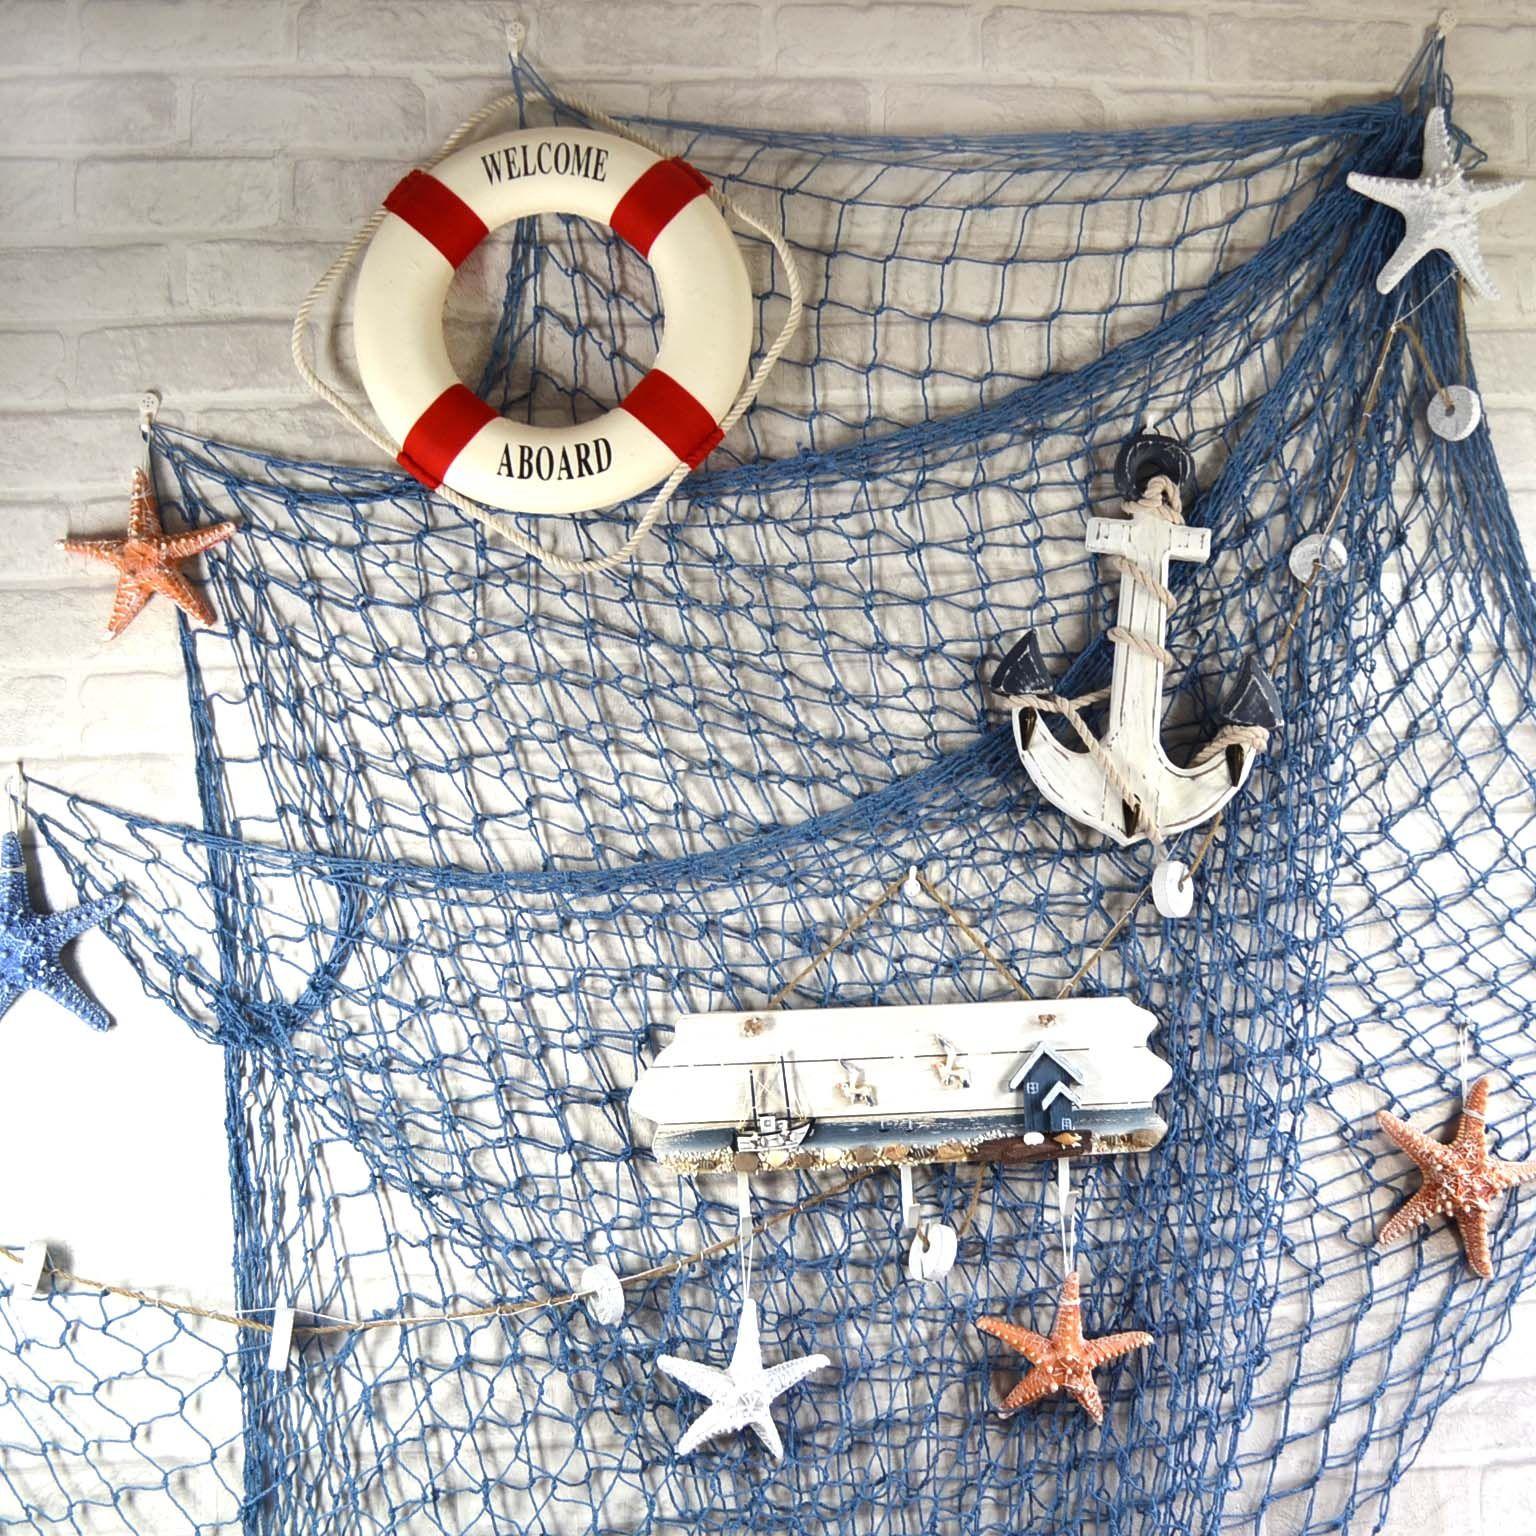 Beach Theme Decorations For Home: Fish Net Decor, Fishnet, Ocean House